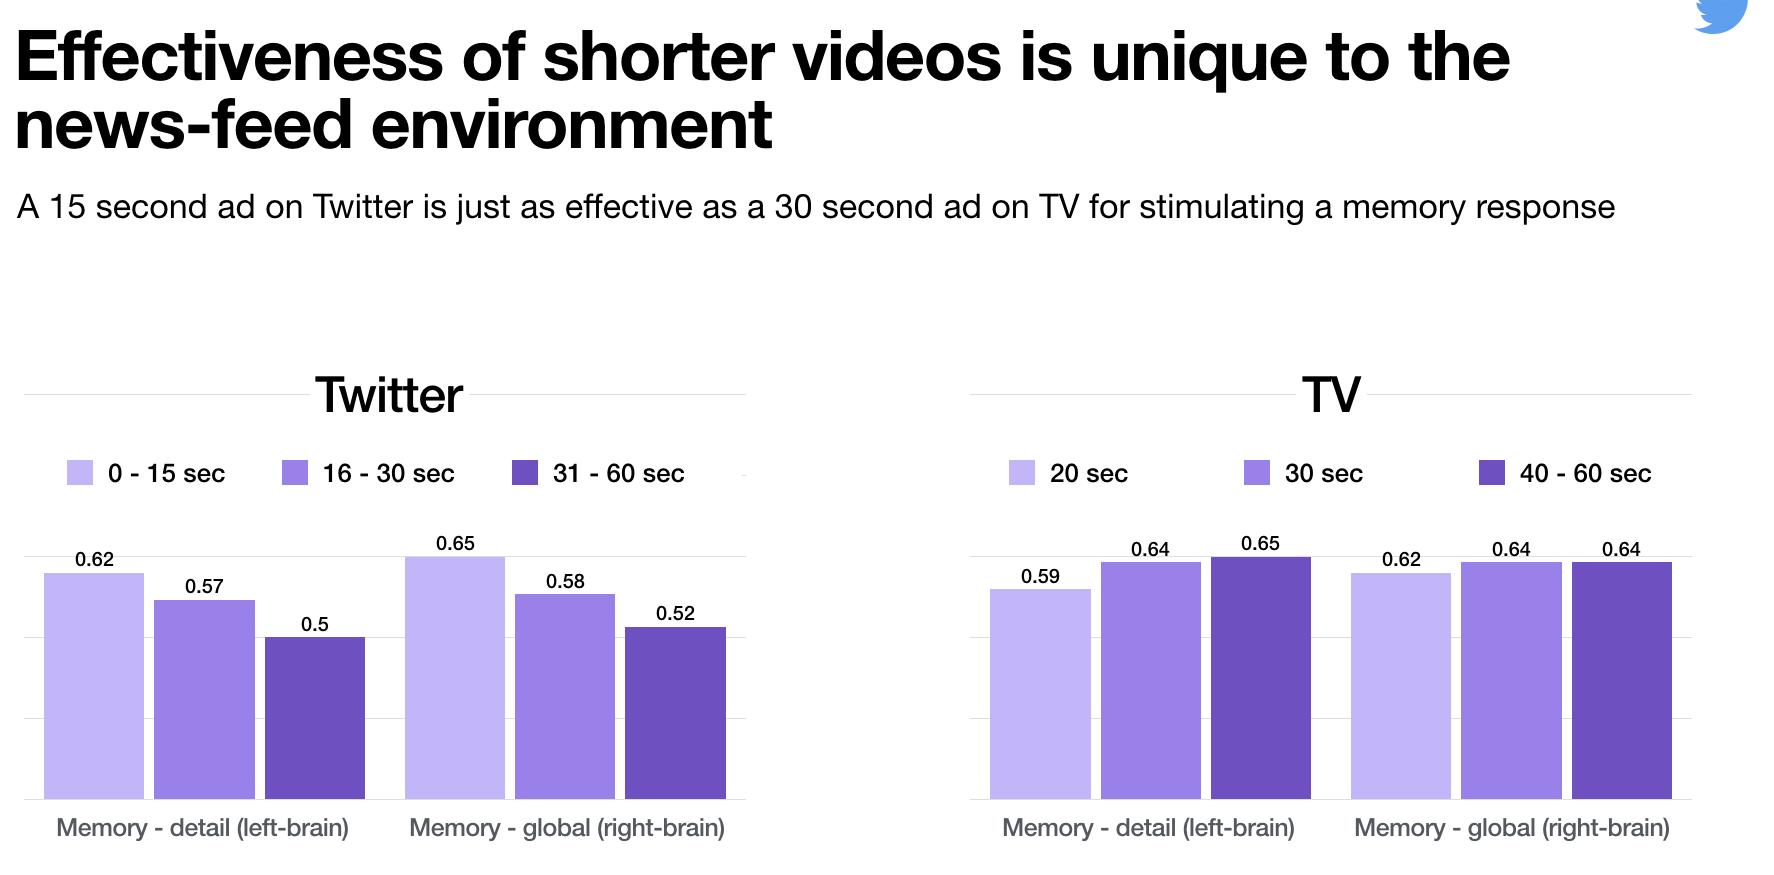 Effectiveness of Twitter Videos